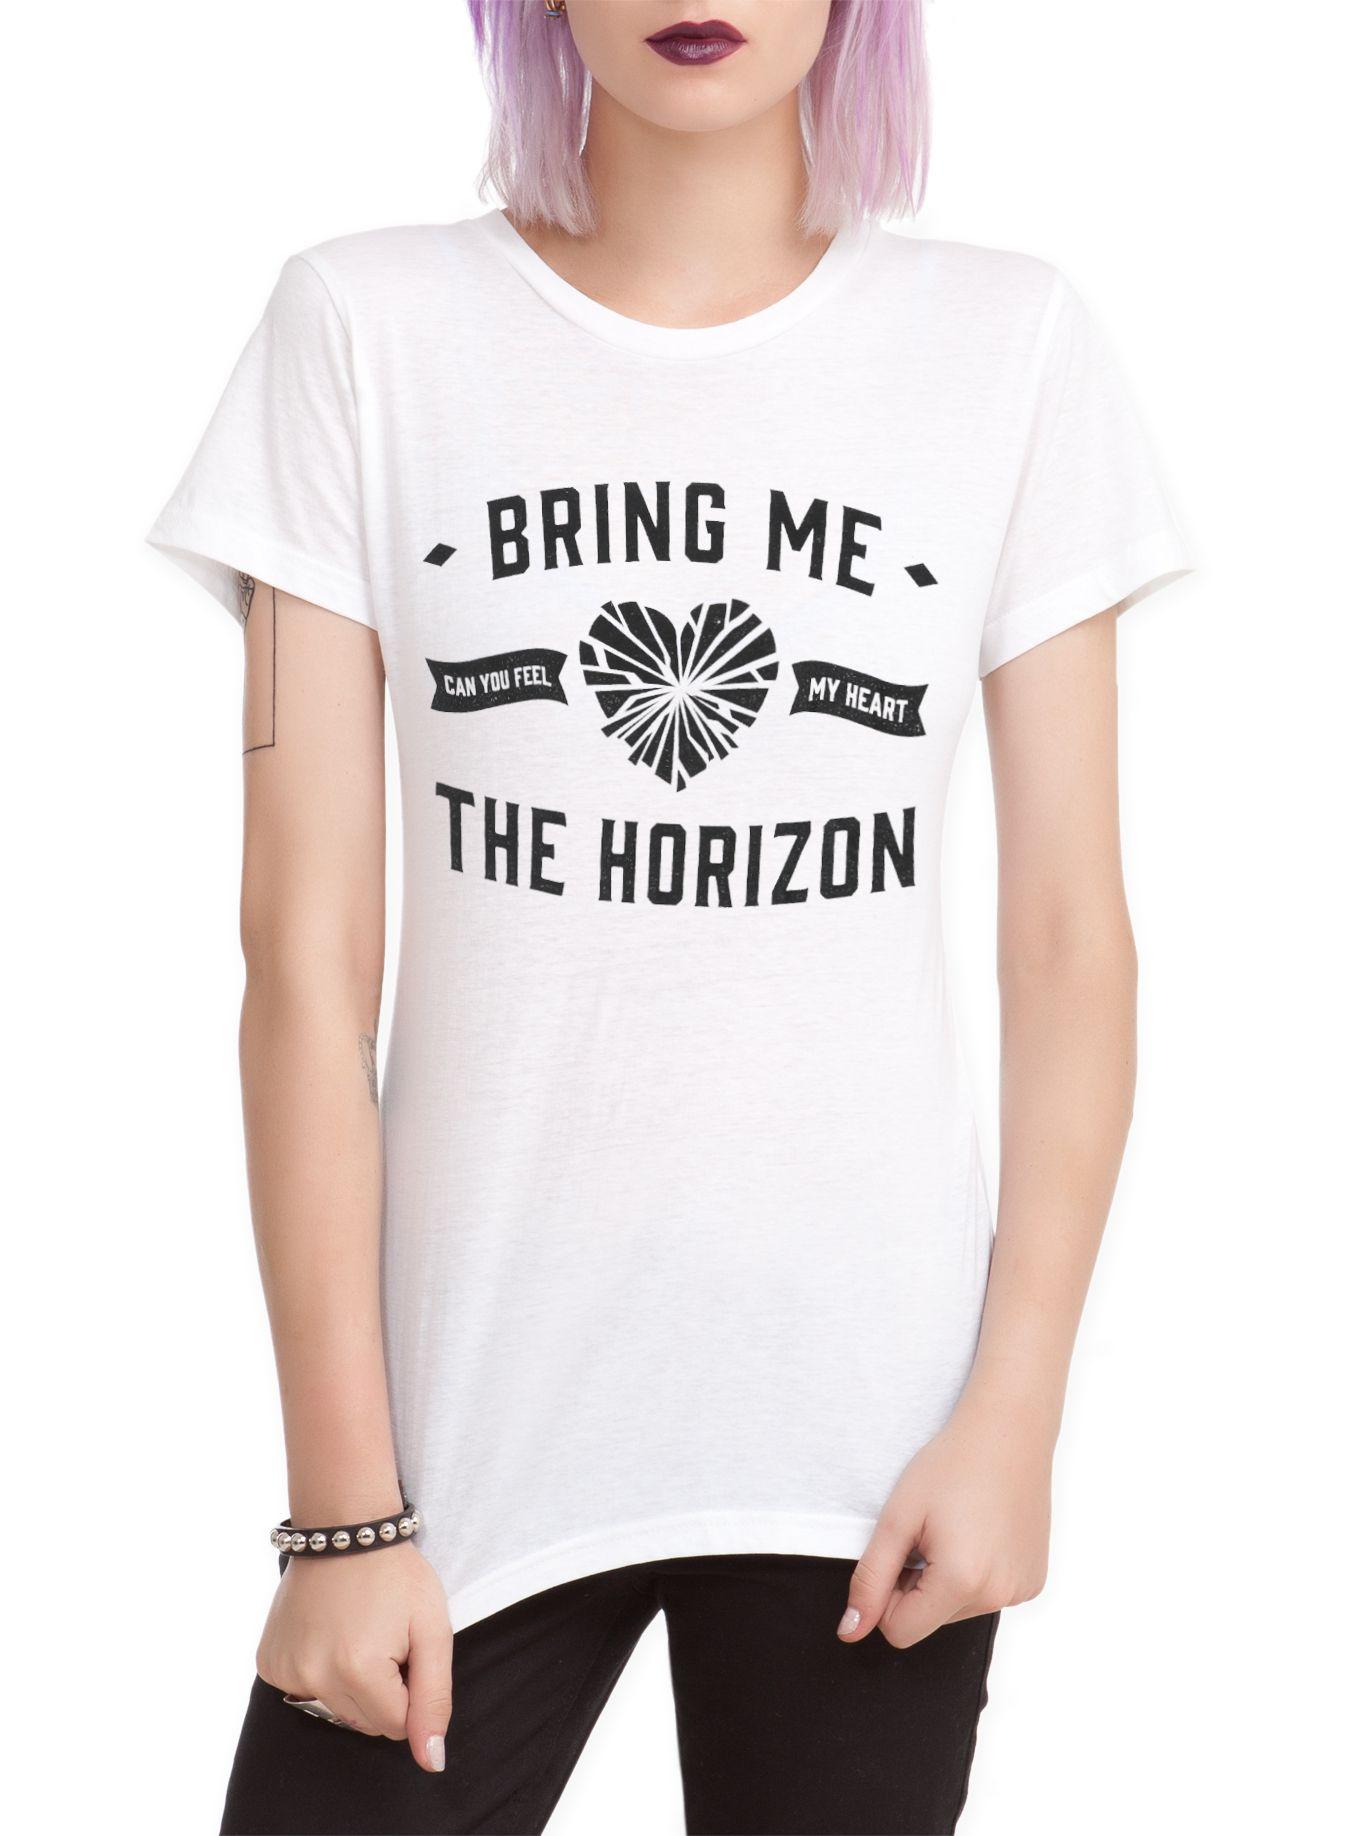 Bring Me The Horizon Shirt Hot Topic Bring Me The Horizon H...